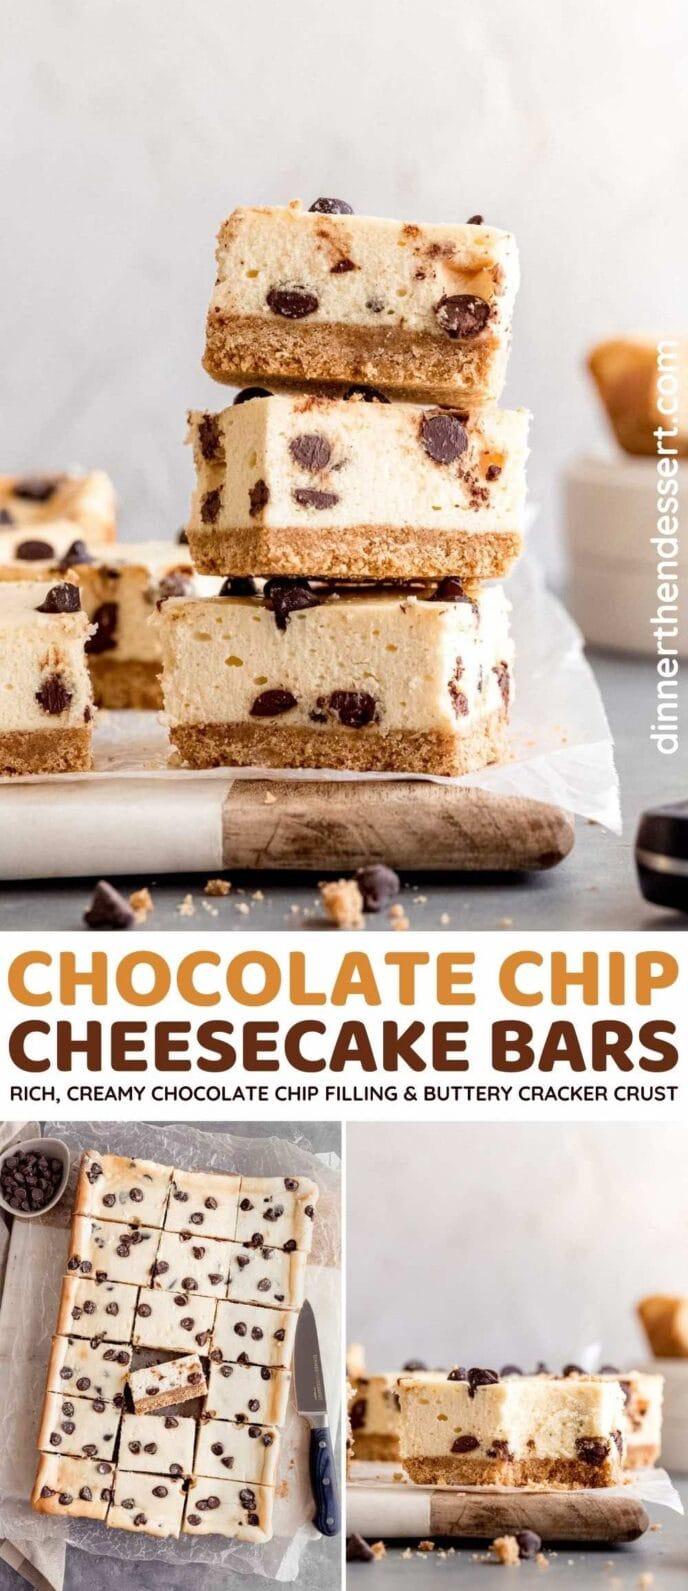 Chocolate Chip Cheesecake Bars collage